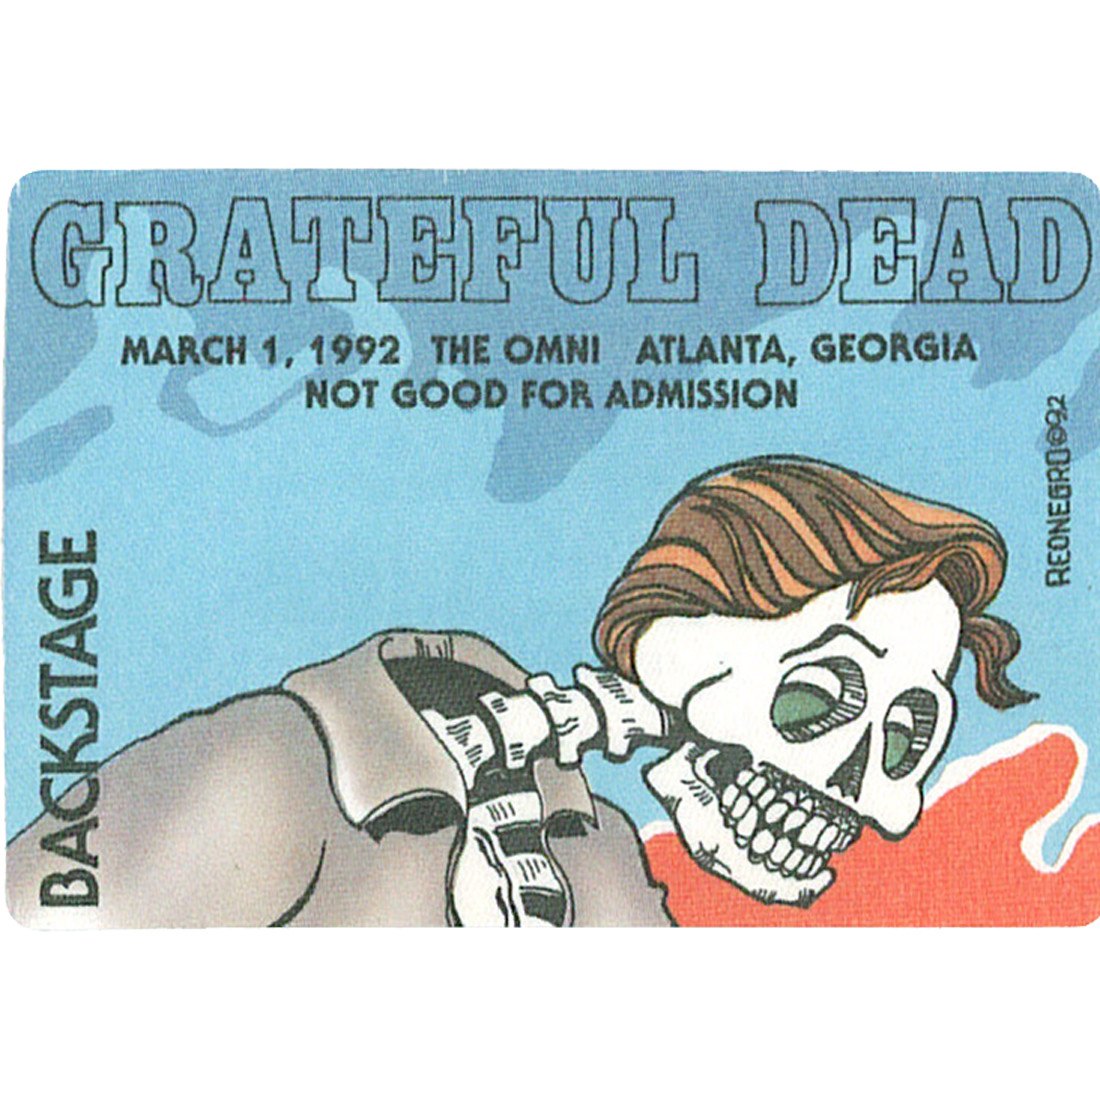 Grateful Dead 1992 03-01 Backstage Pass